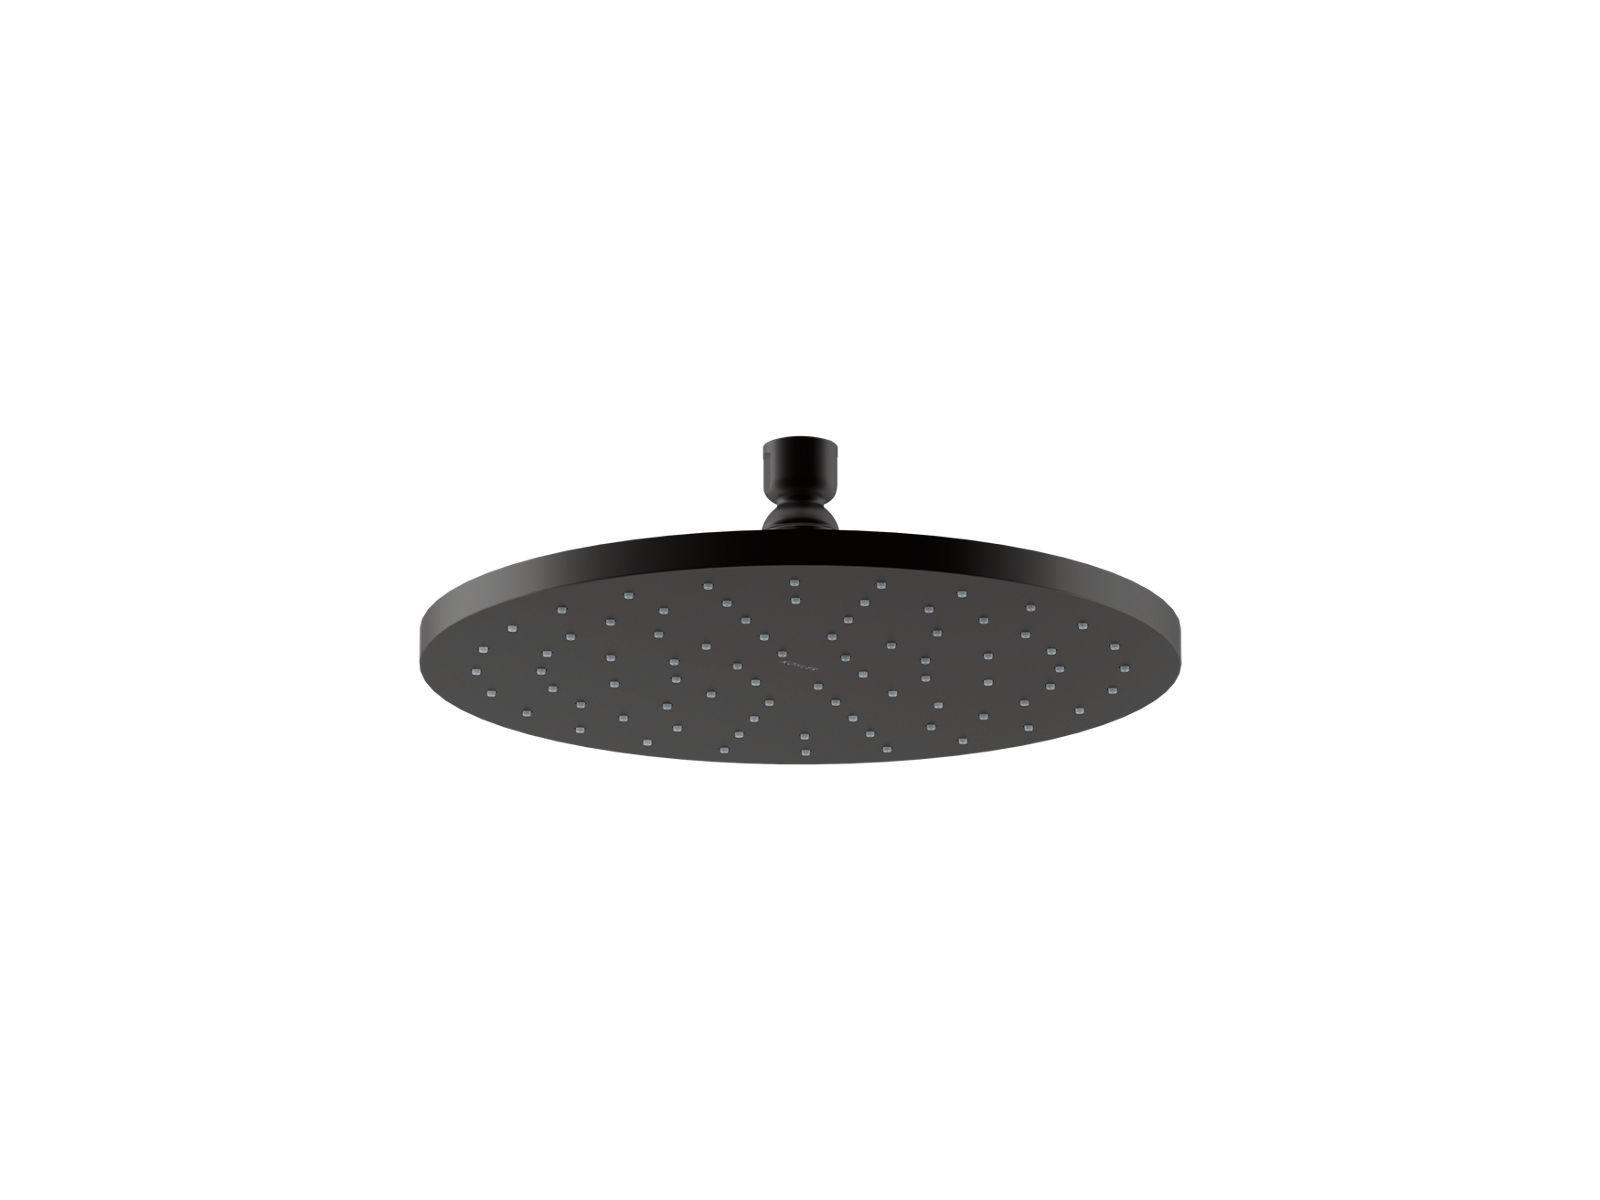 K 13689 10 Inch Contemporary Round Rain Showerhead 2 5 Gpm